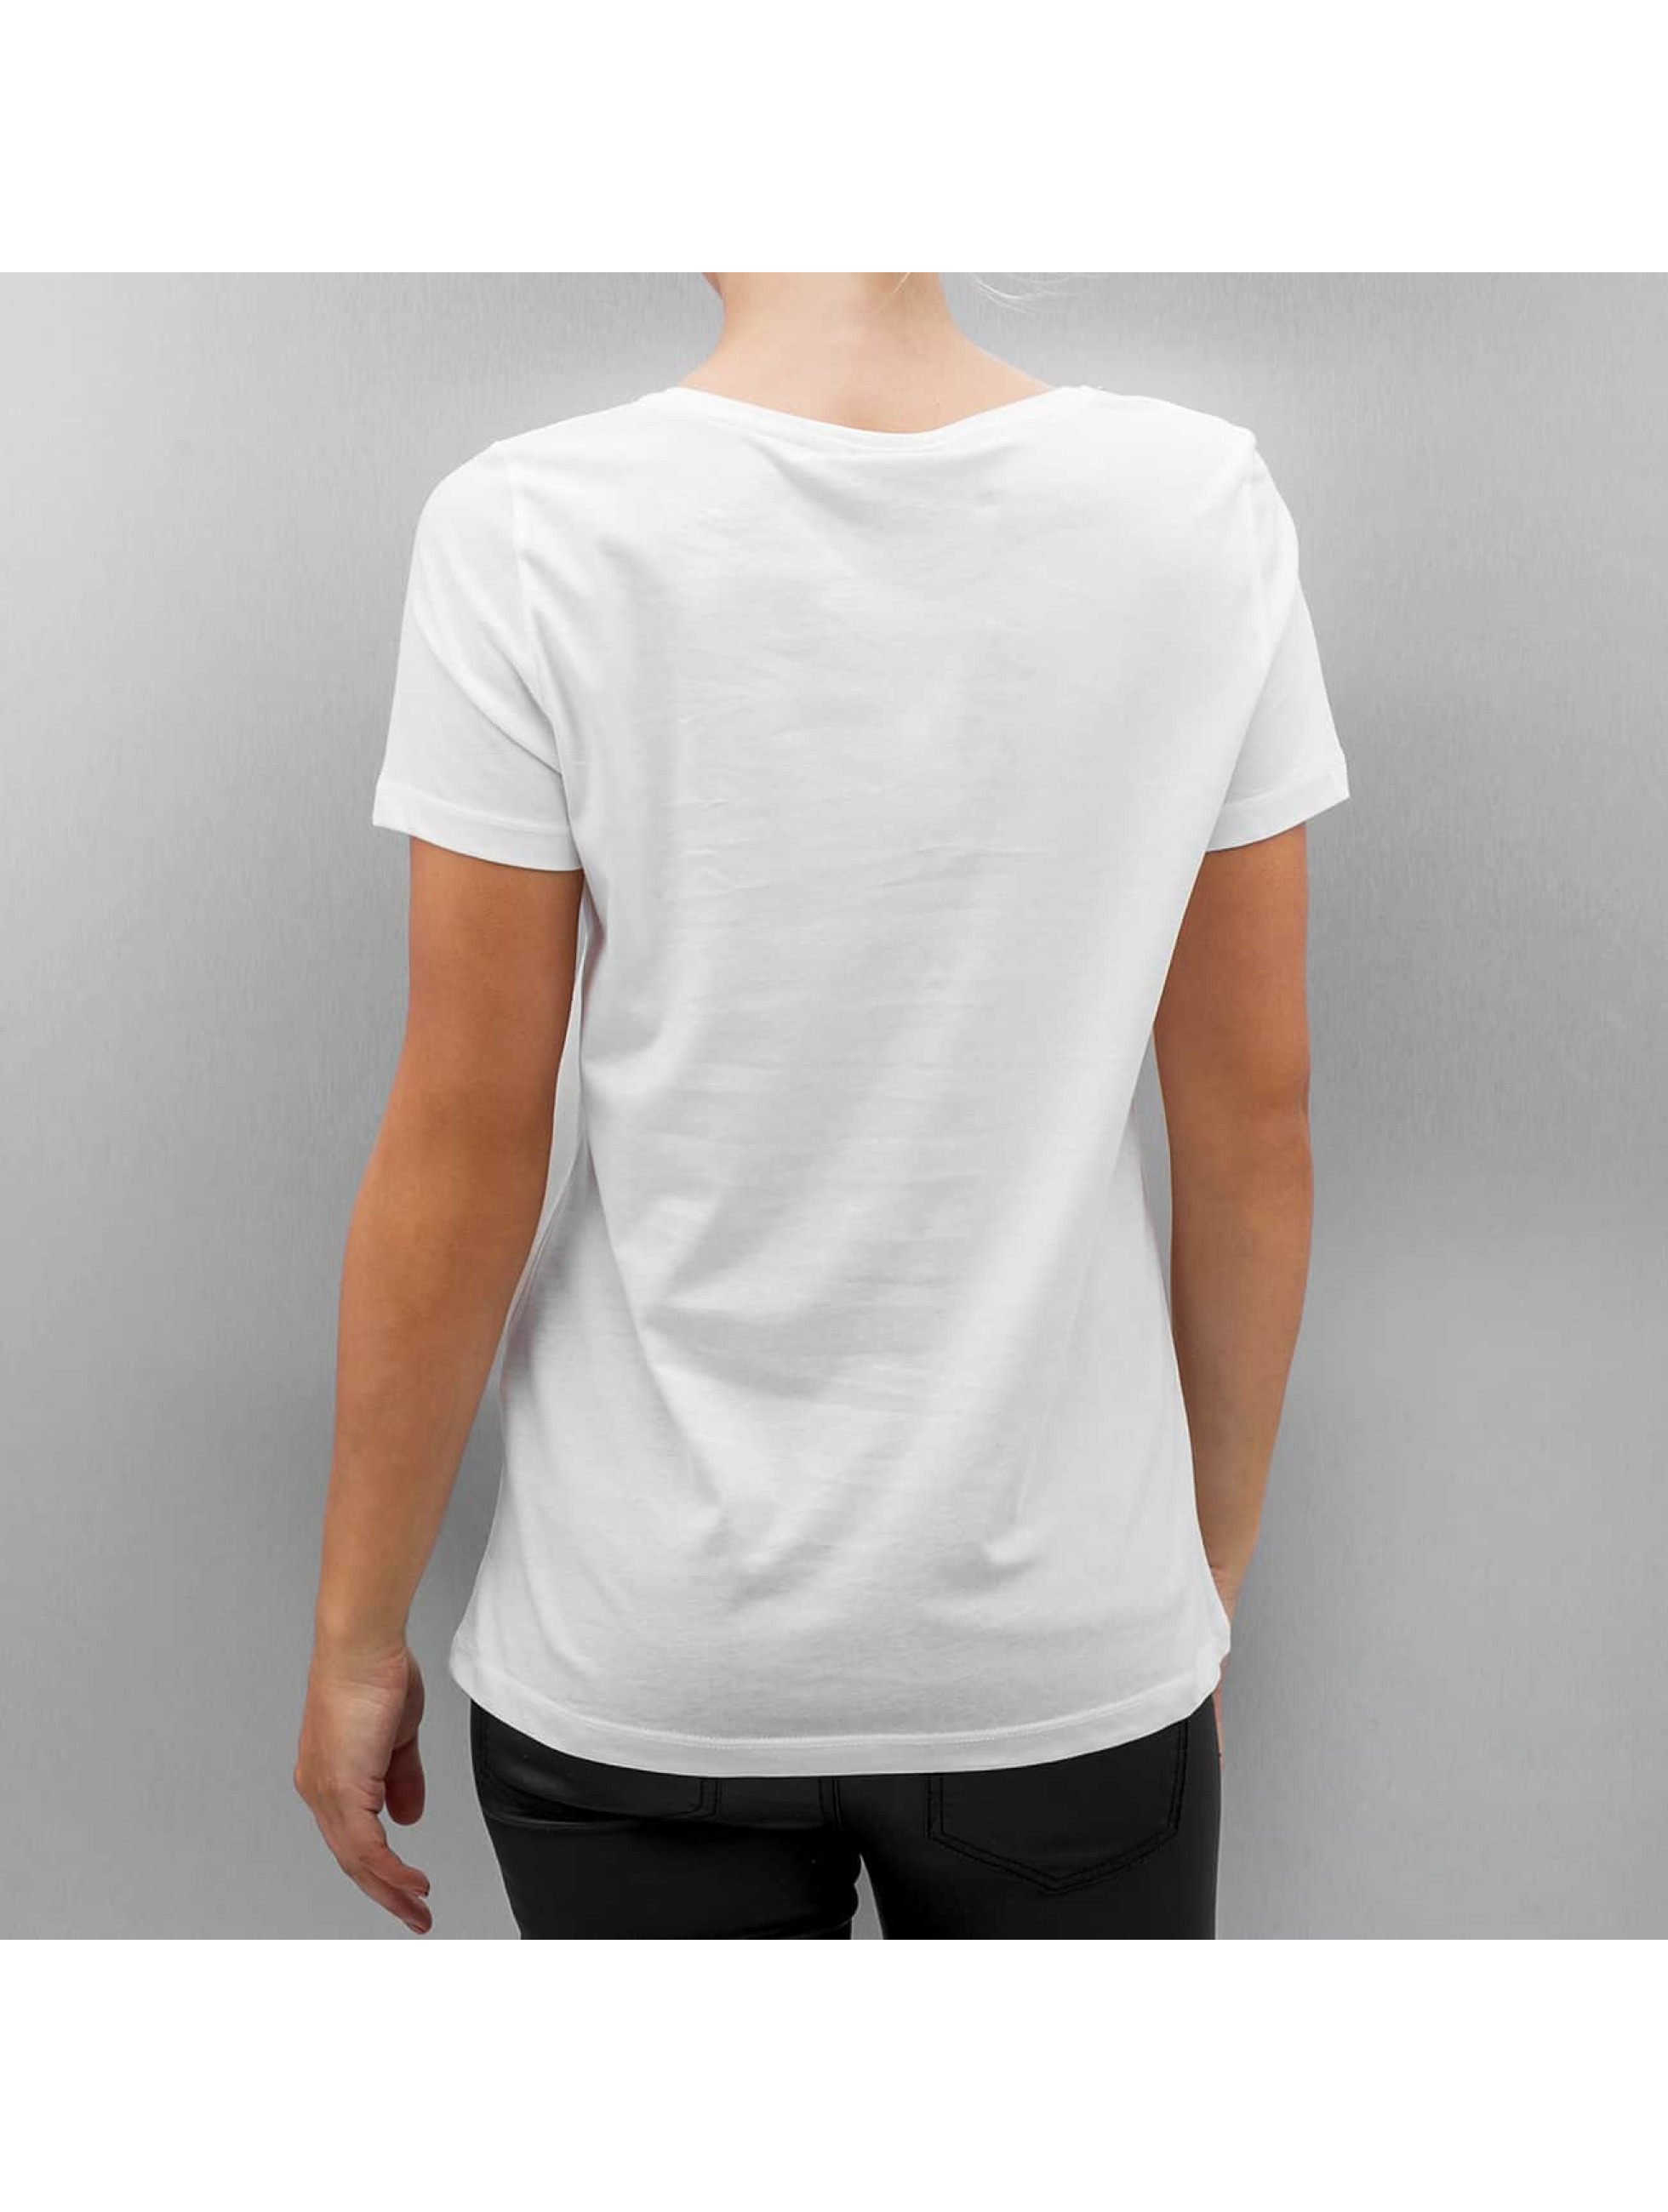 Vero Moda t-shirt VmMy wit